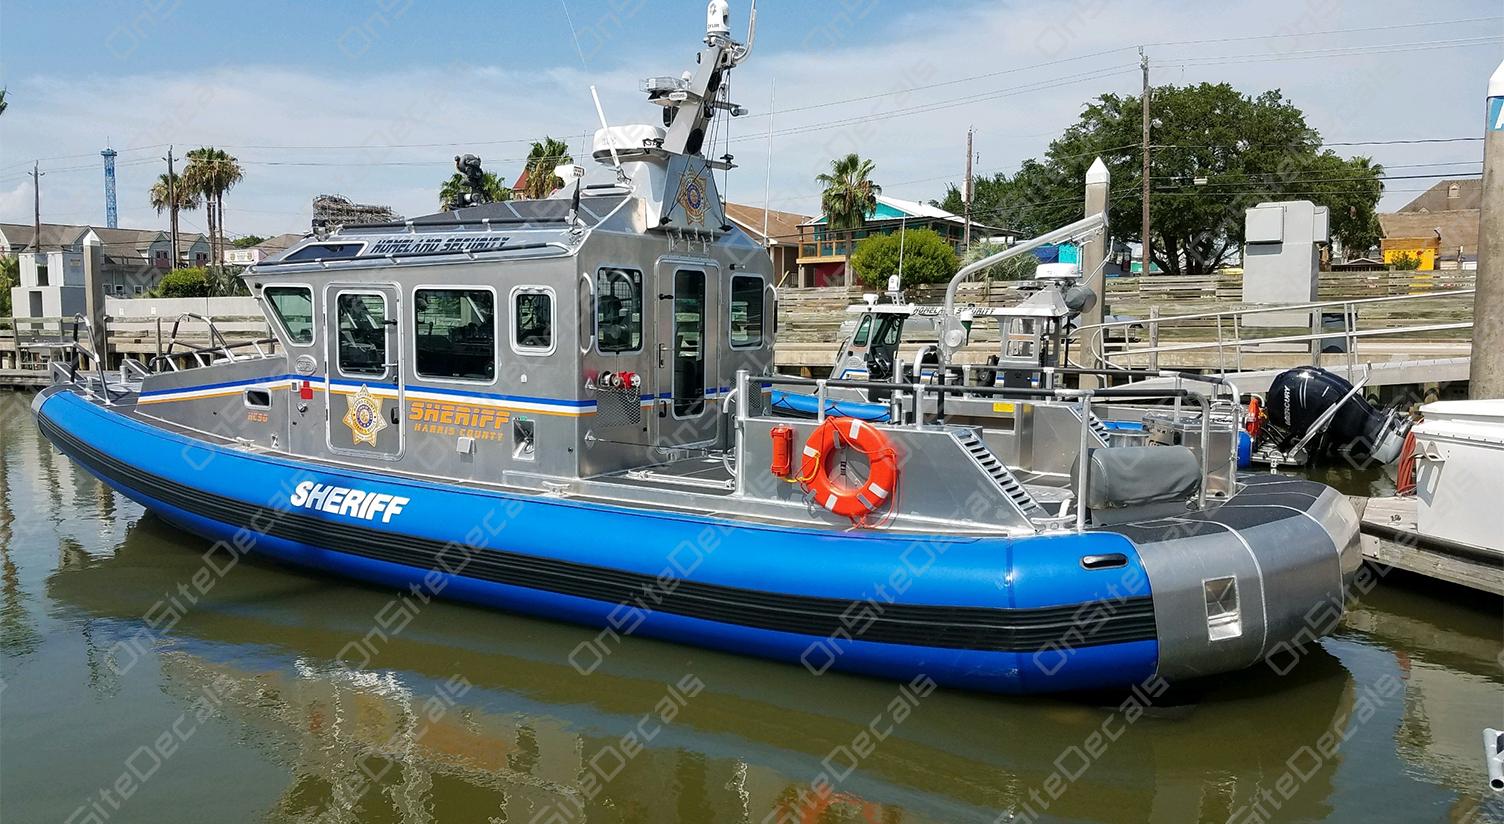 hcso-boat.png